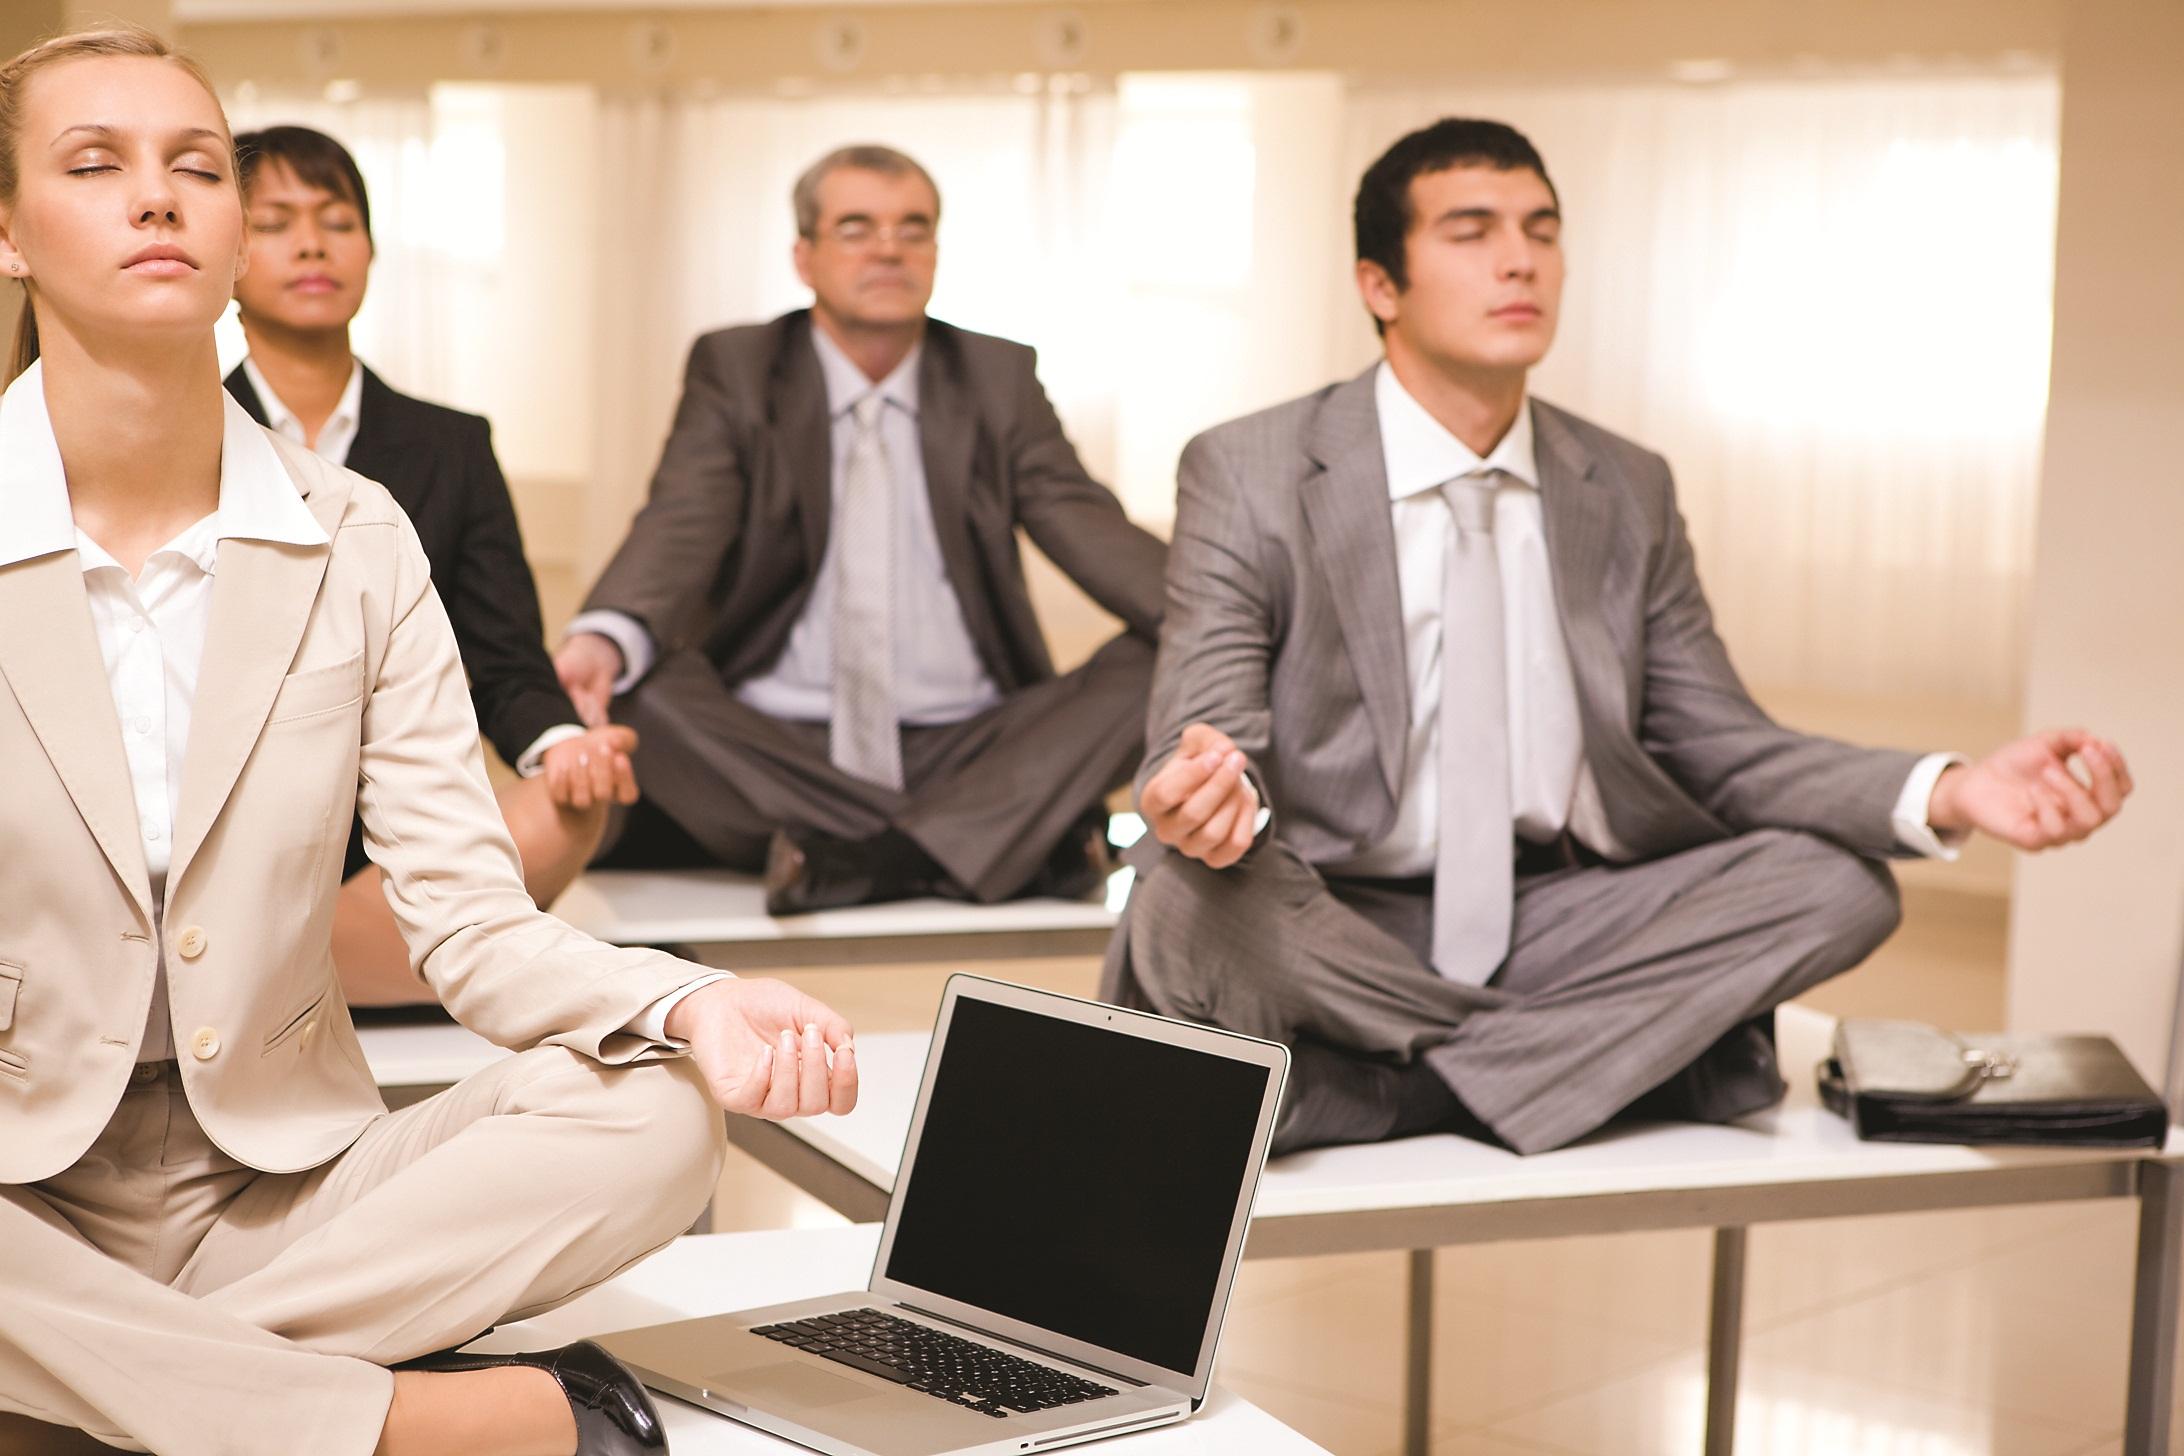 Meditation relaxation photo (2)